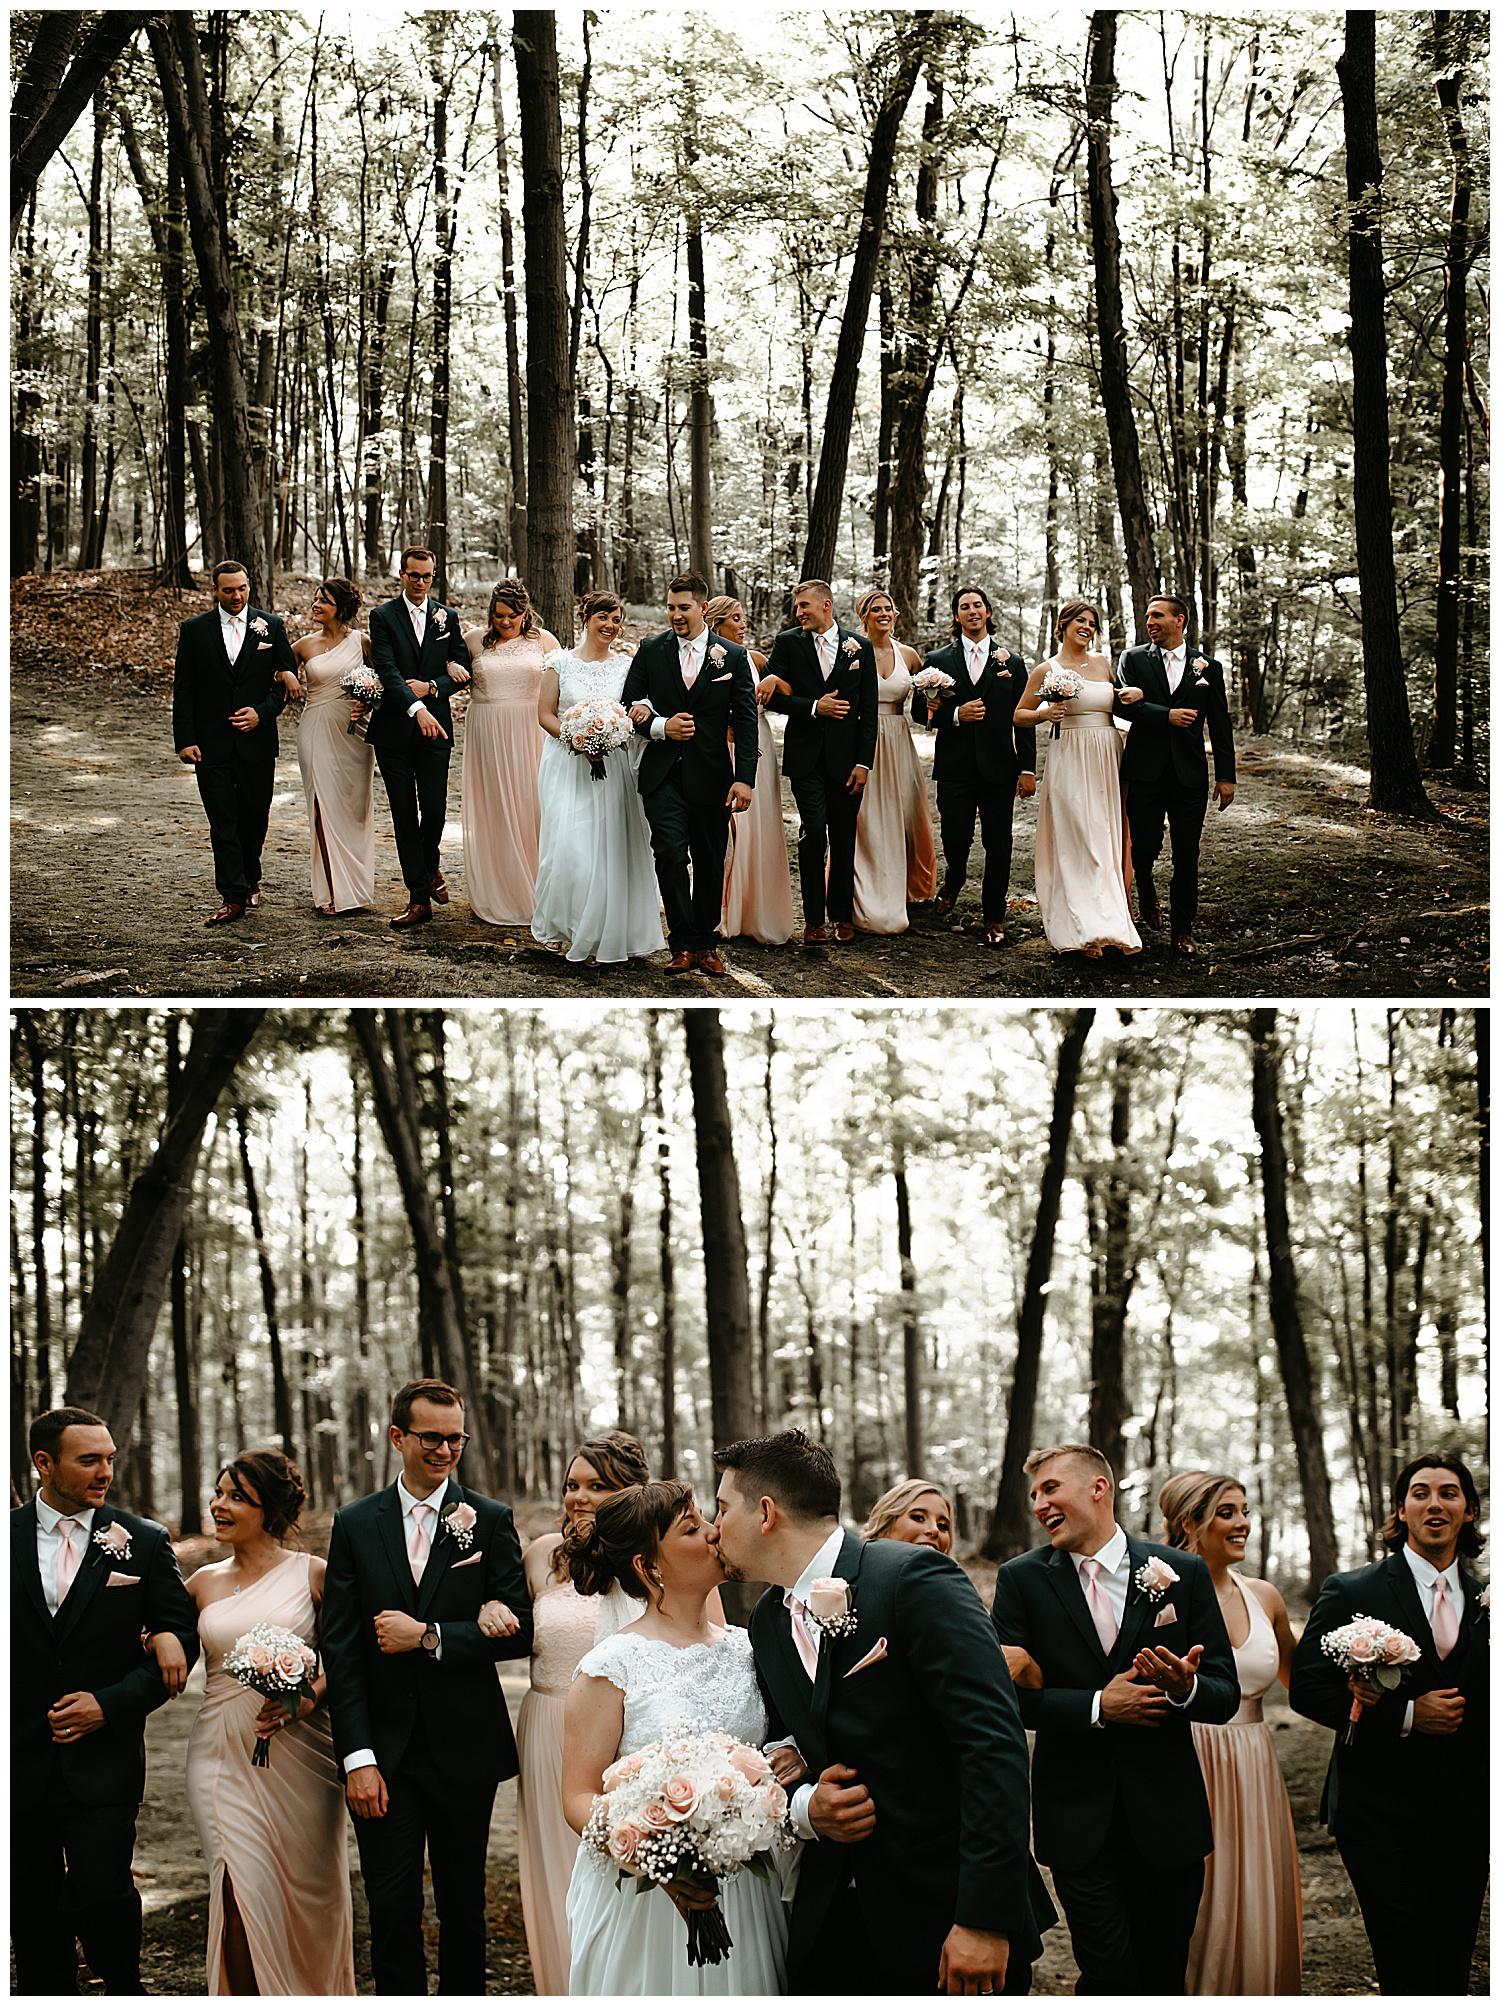 NEPA-Mount-Pocono-Wedding-Photographer-at-the-Stroudsmoor-Country-Inn-Stroudsburg-PA_0043.jpg